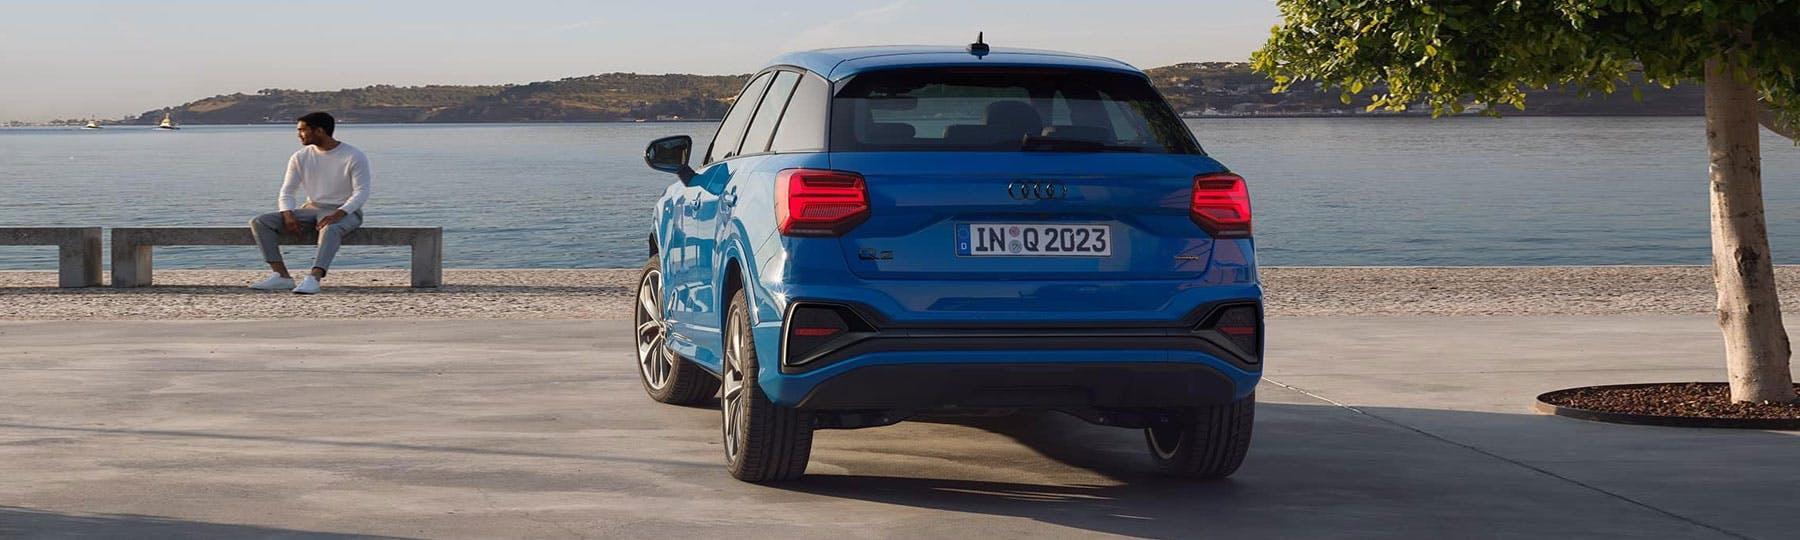 Audi Q2 Motability